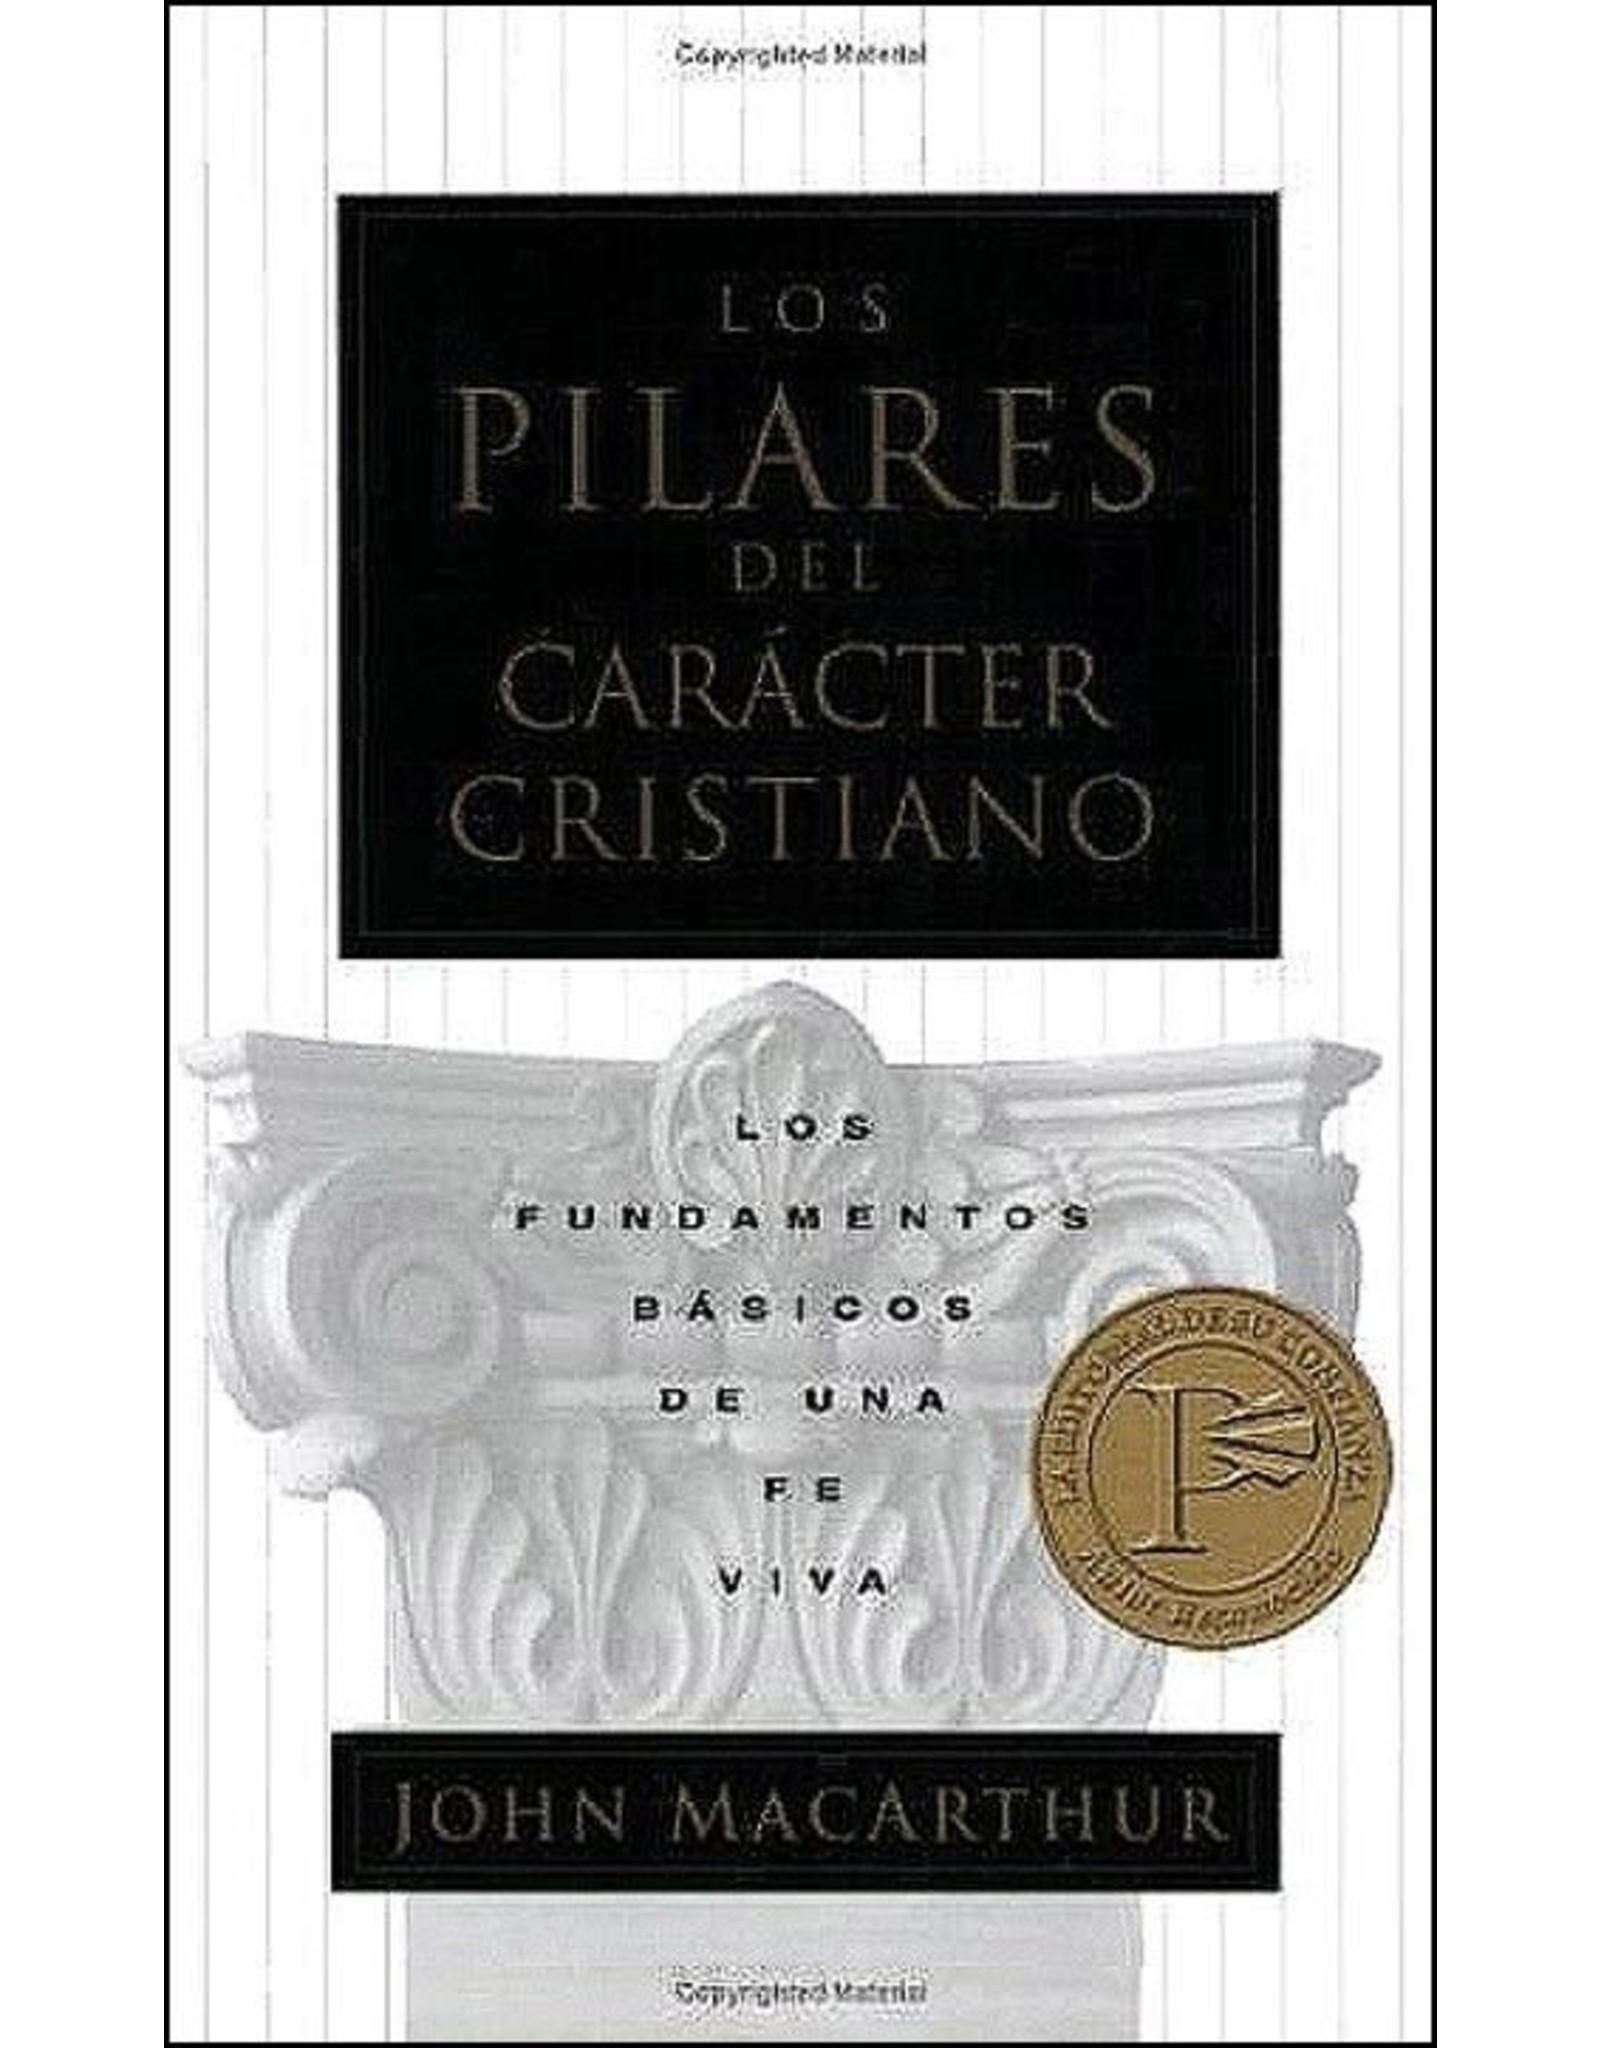 Kregel / Portavoz / Ingram Spanish-Pillars of Christian Character (Los Pilares del Caracter Cristiano)